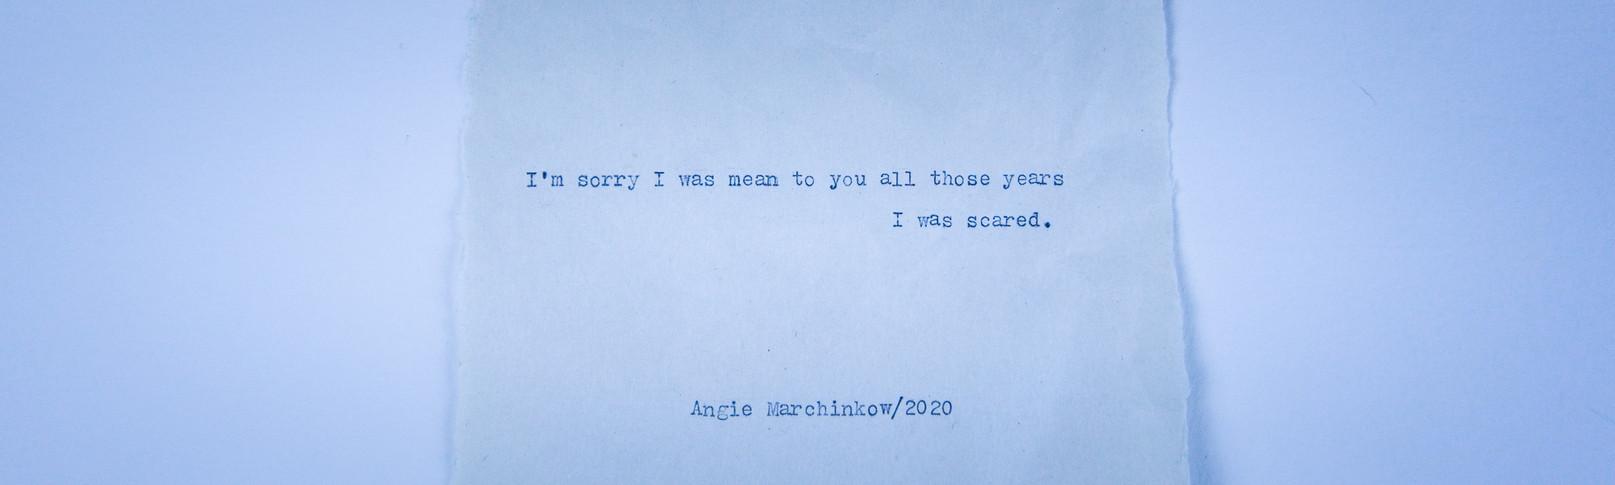 #25 - I'm sorry